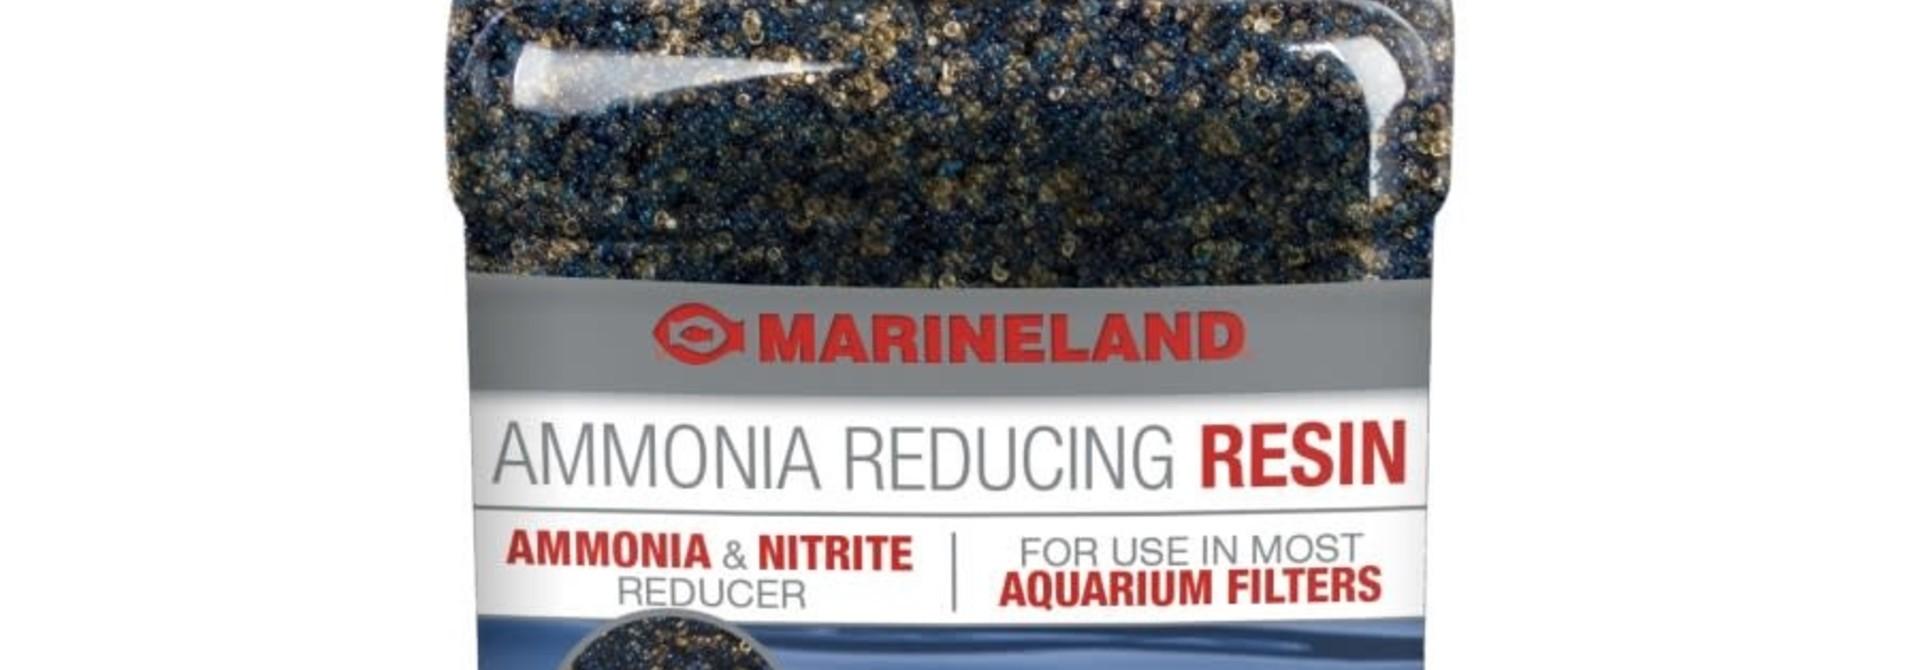 Ammonia Reducing Resin 7.76oz